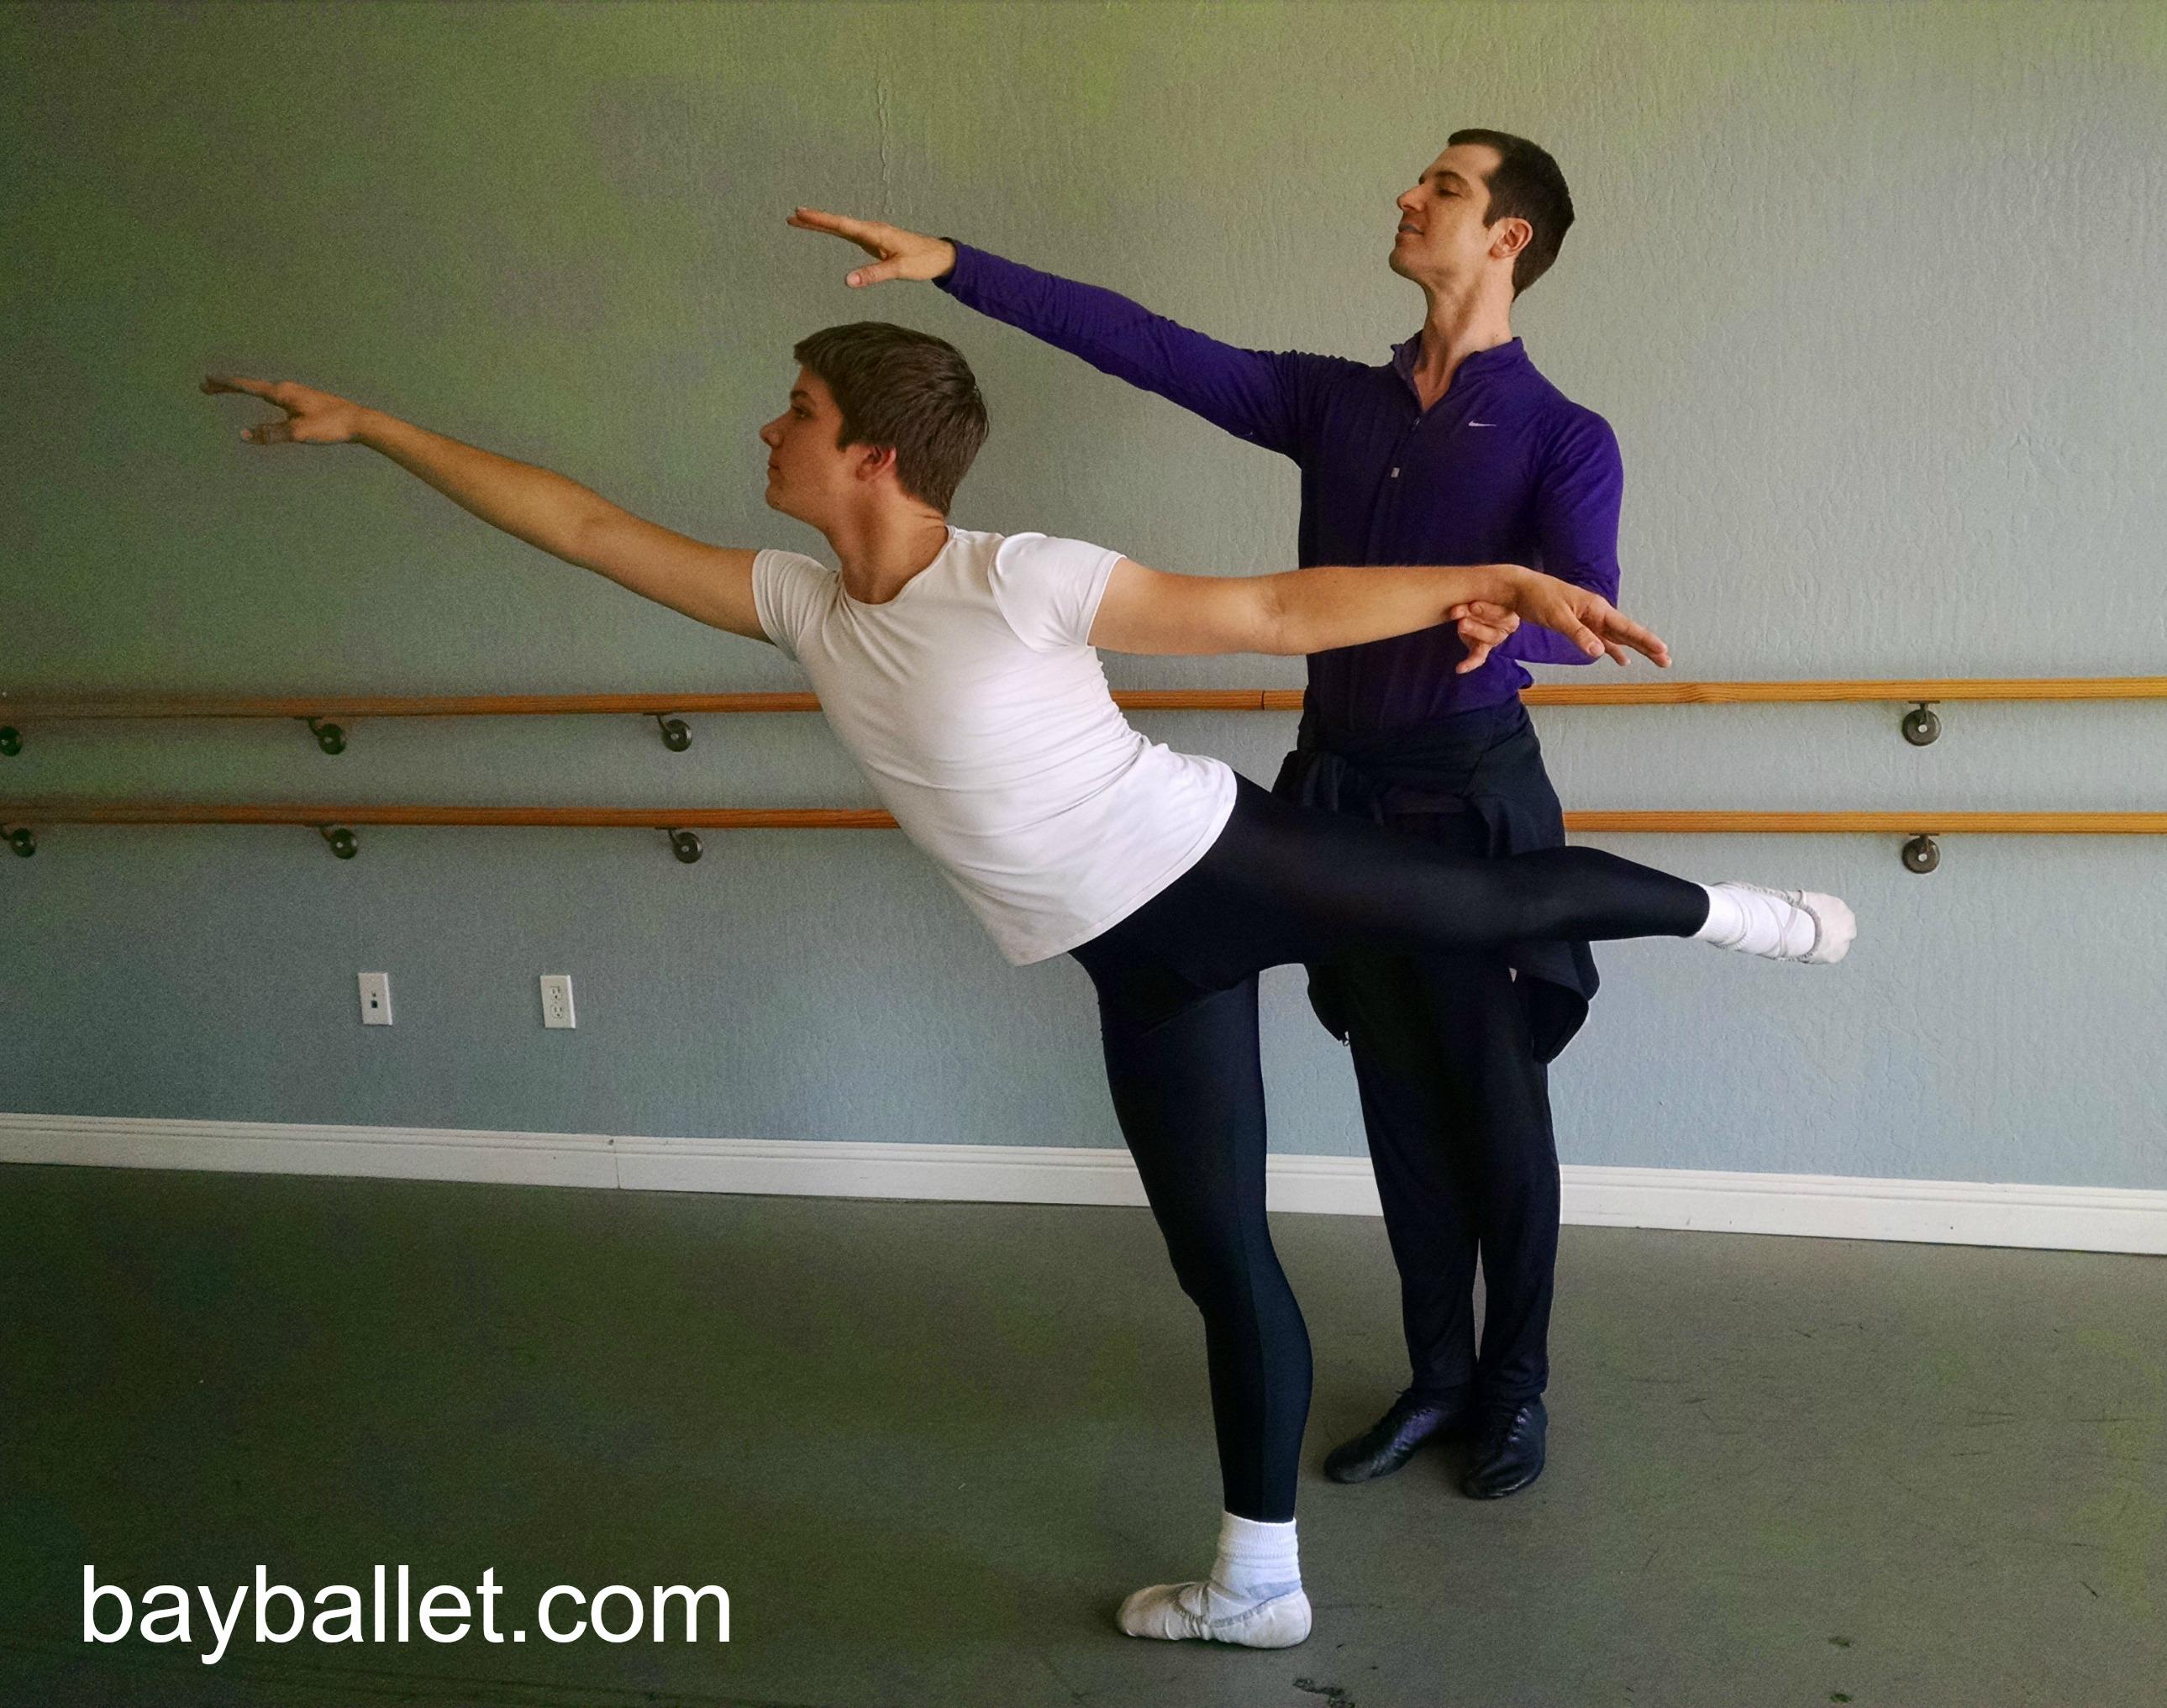 Bay_Ballet_Academy_San_Jose_Willow_Glen_Maximo_Califano_Dance_Classes_Jazz_Lyrical_Hip_Hop_Modern_Neoclassical_Class_9